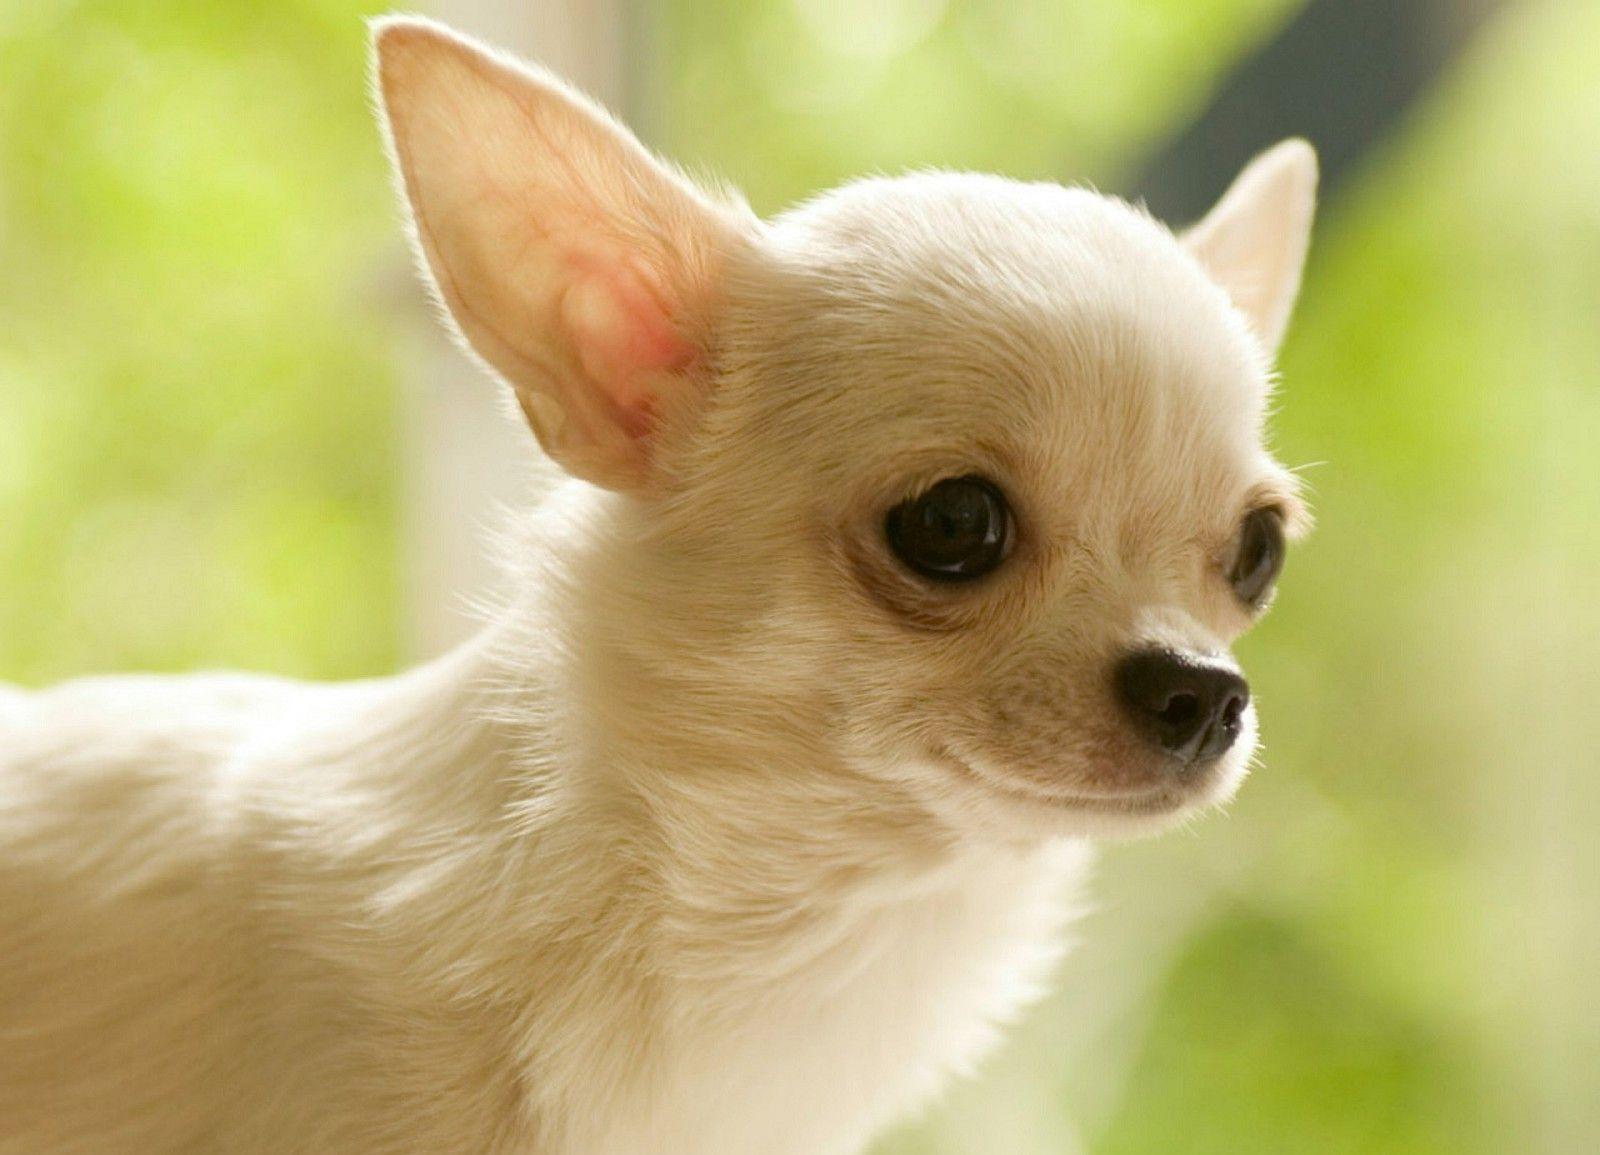 Teacup Chihuahua Hd Wallpaper 1280 720 Beraplan Avec Images